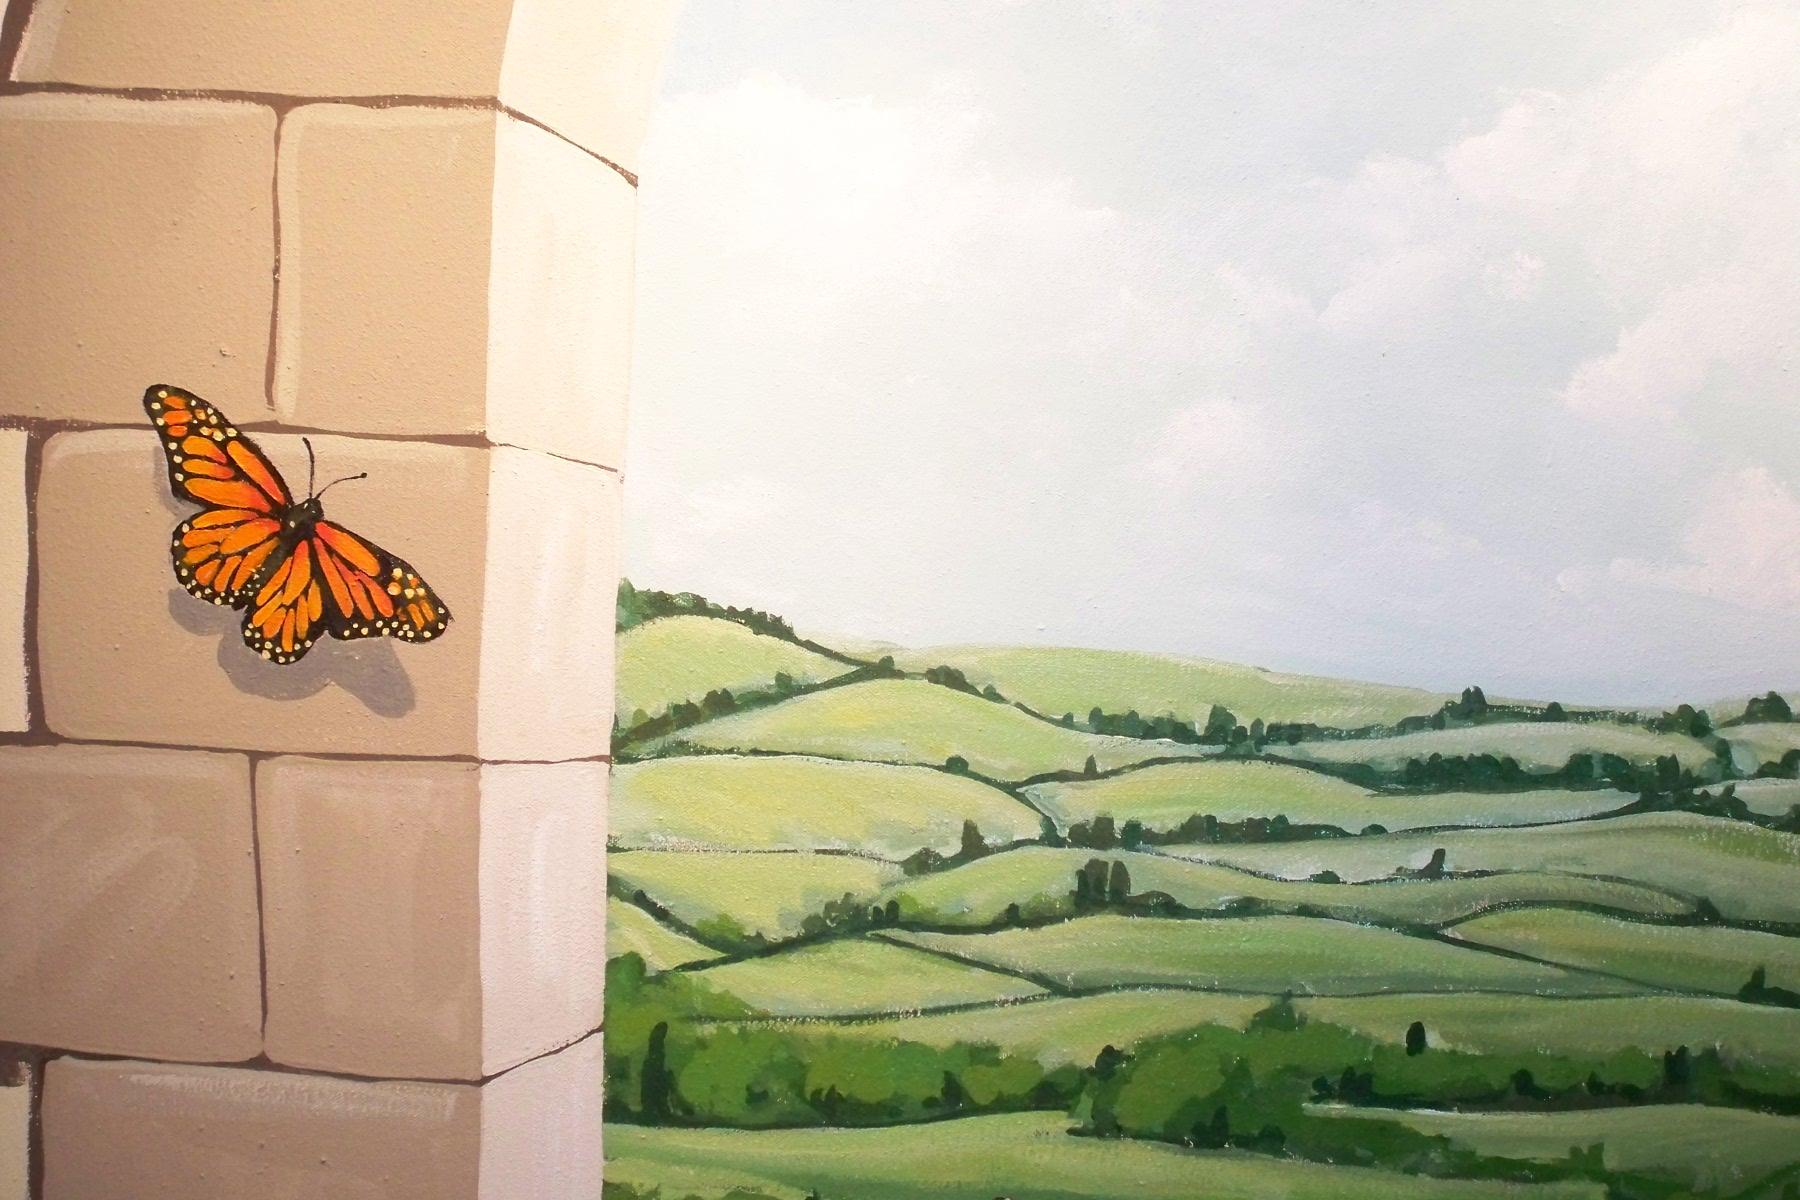 Murals By Marg Butterfly Playroom Mural 4.JPG